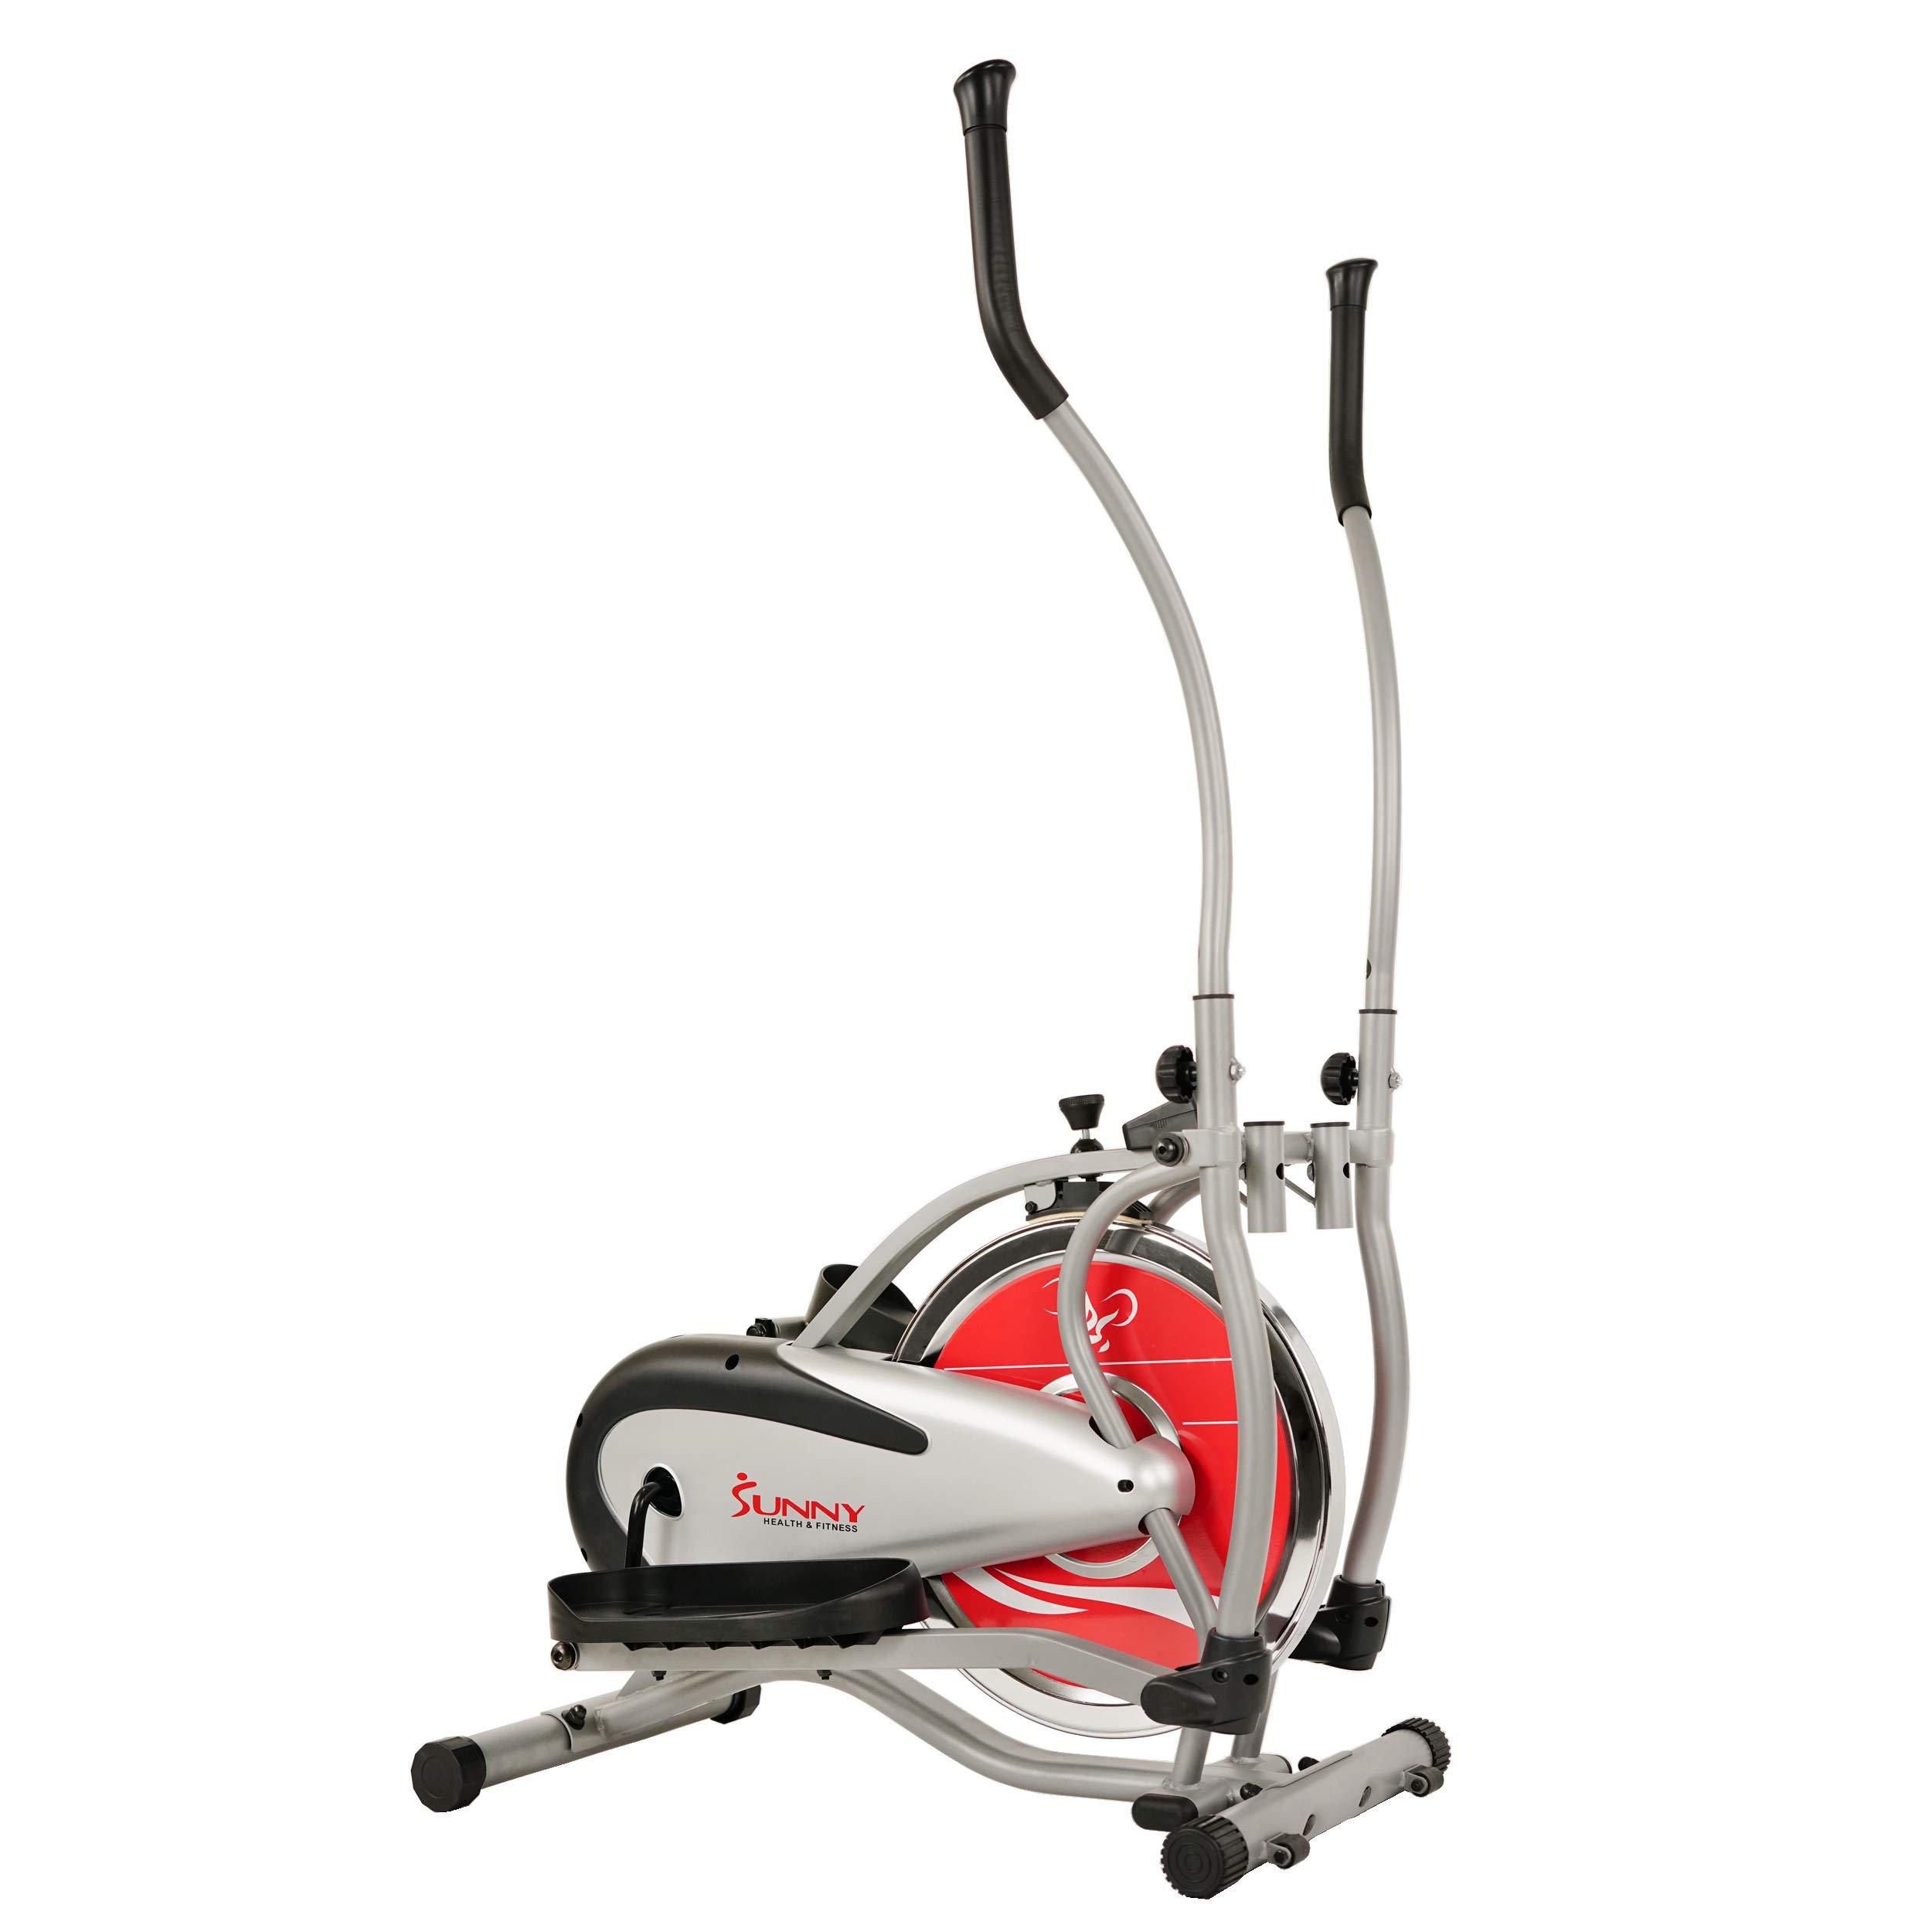 Sunny Health & Fitness SF-E1405 Flywheel Elliptical Trainer, Gray by Sunny Health & Fitness (Image #1)